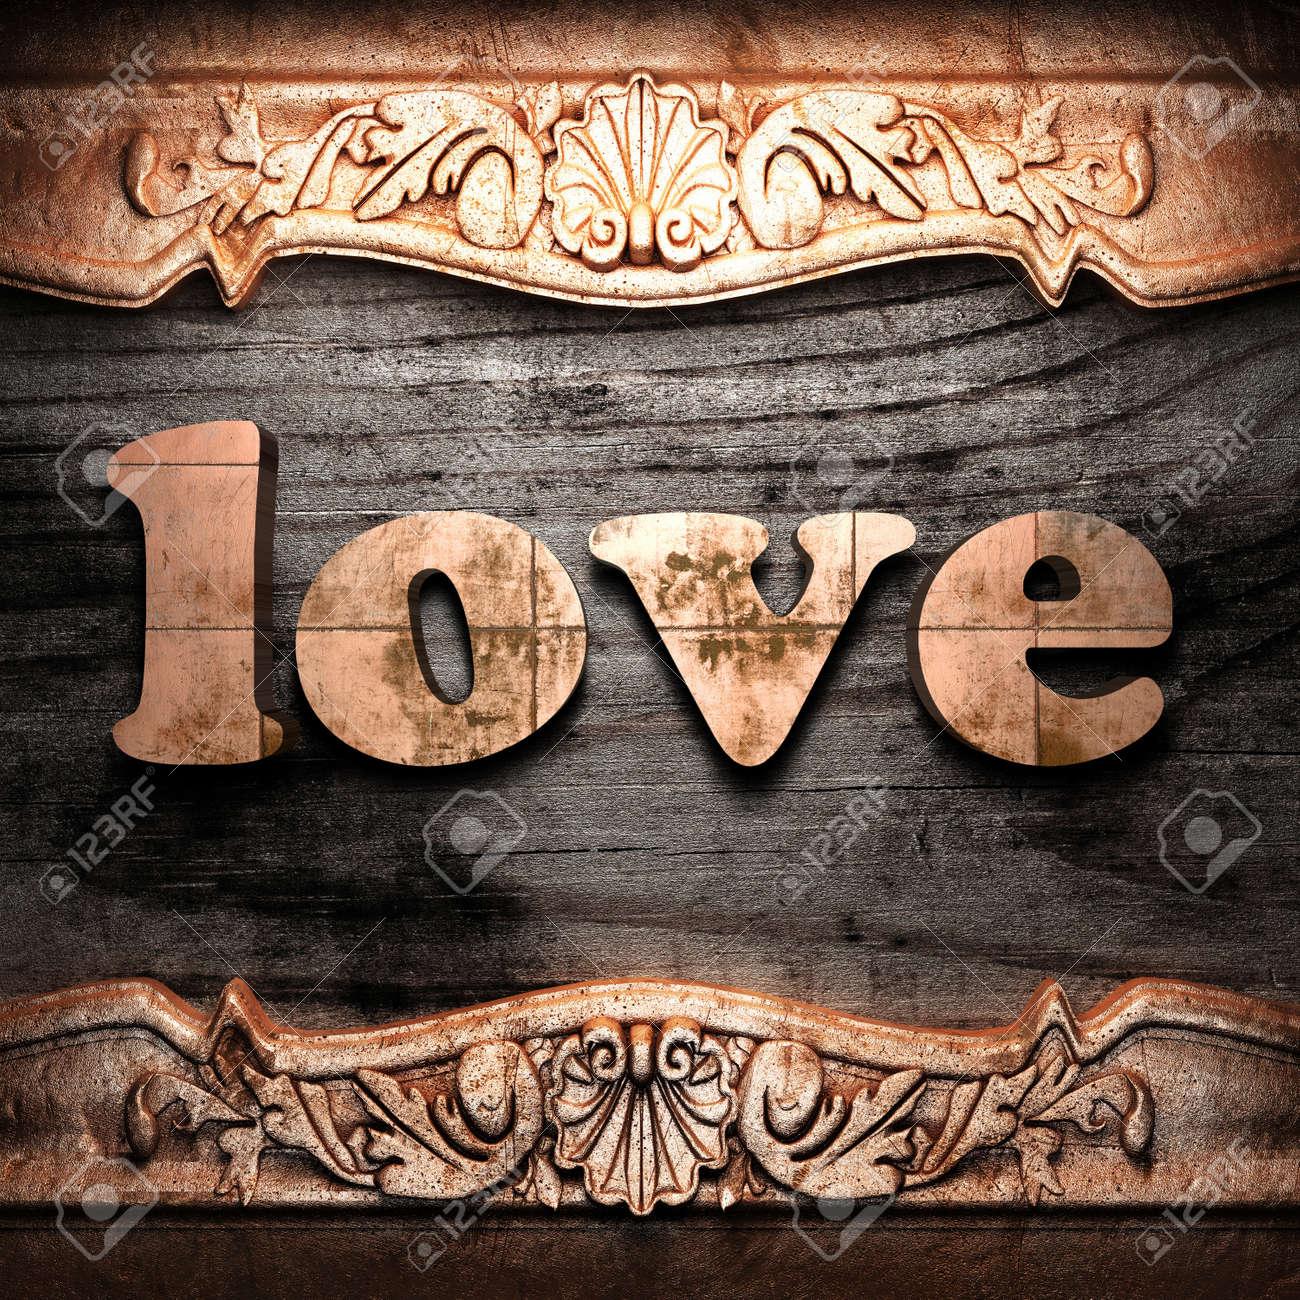 Golden word on wood Stock Photo - 10955224